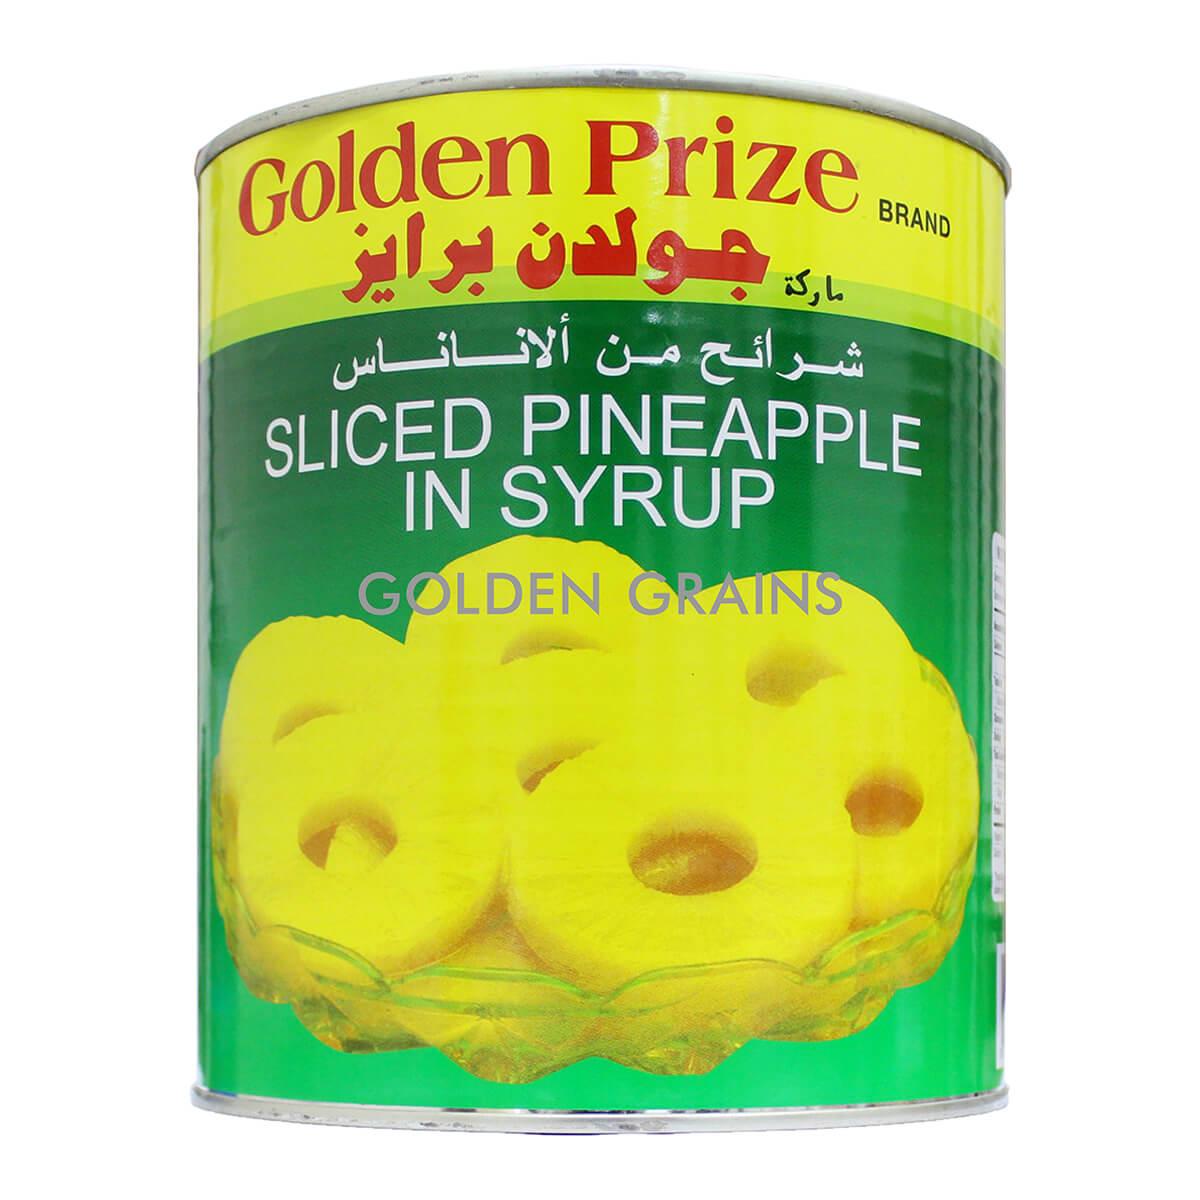 Golden Grains Golden Prize - Pineapple Slice Big - Front.jpg